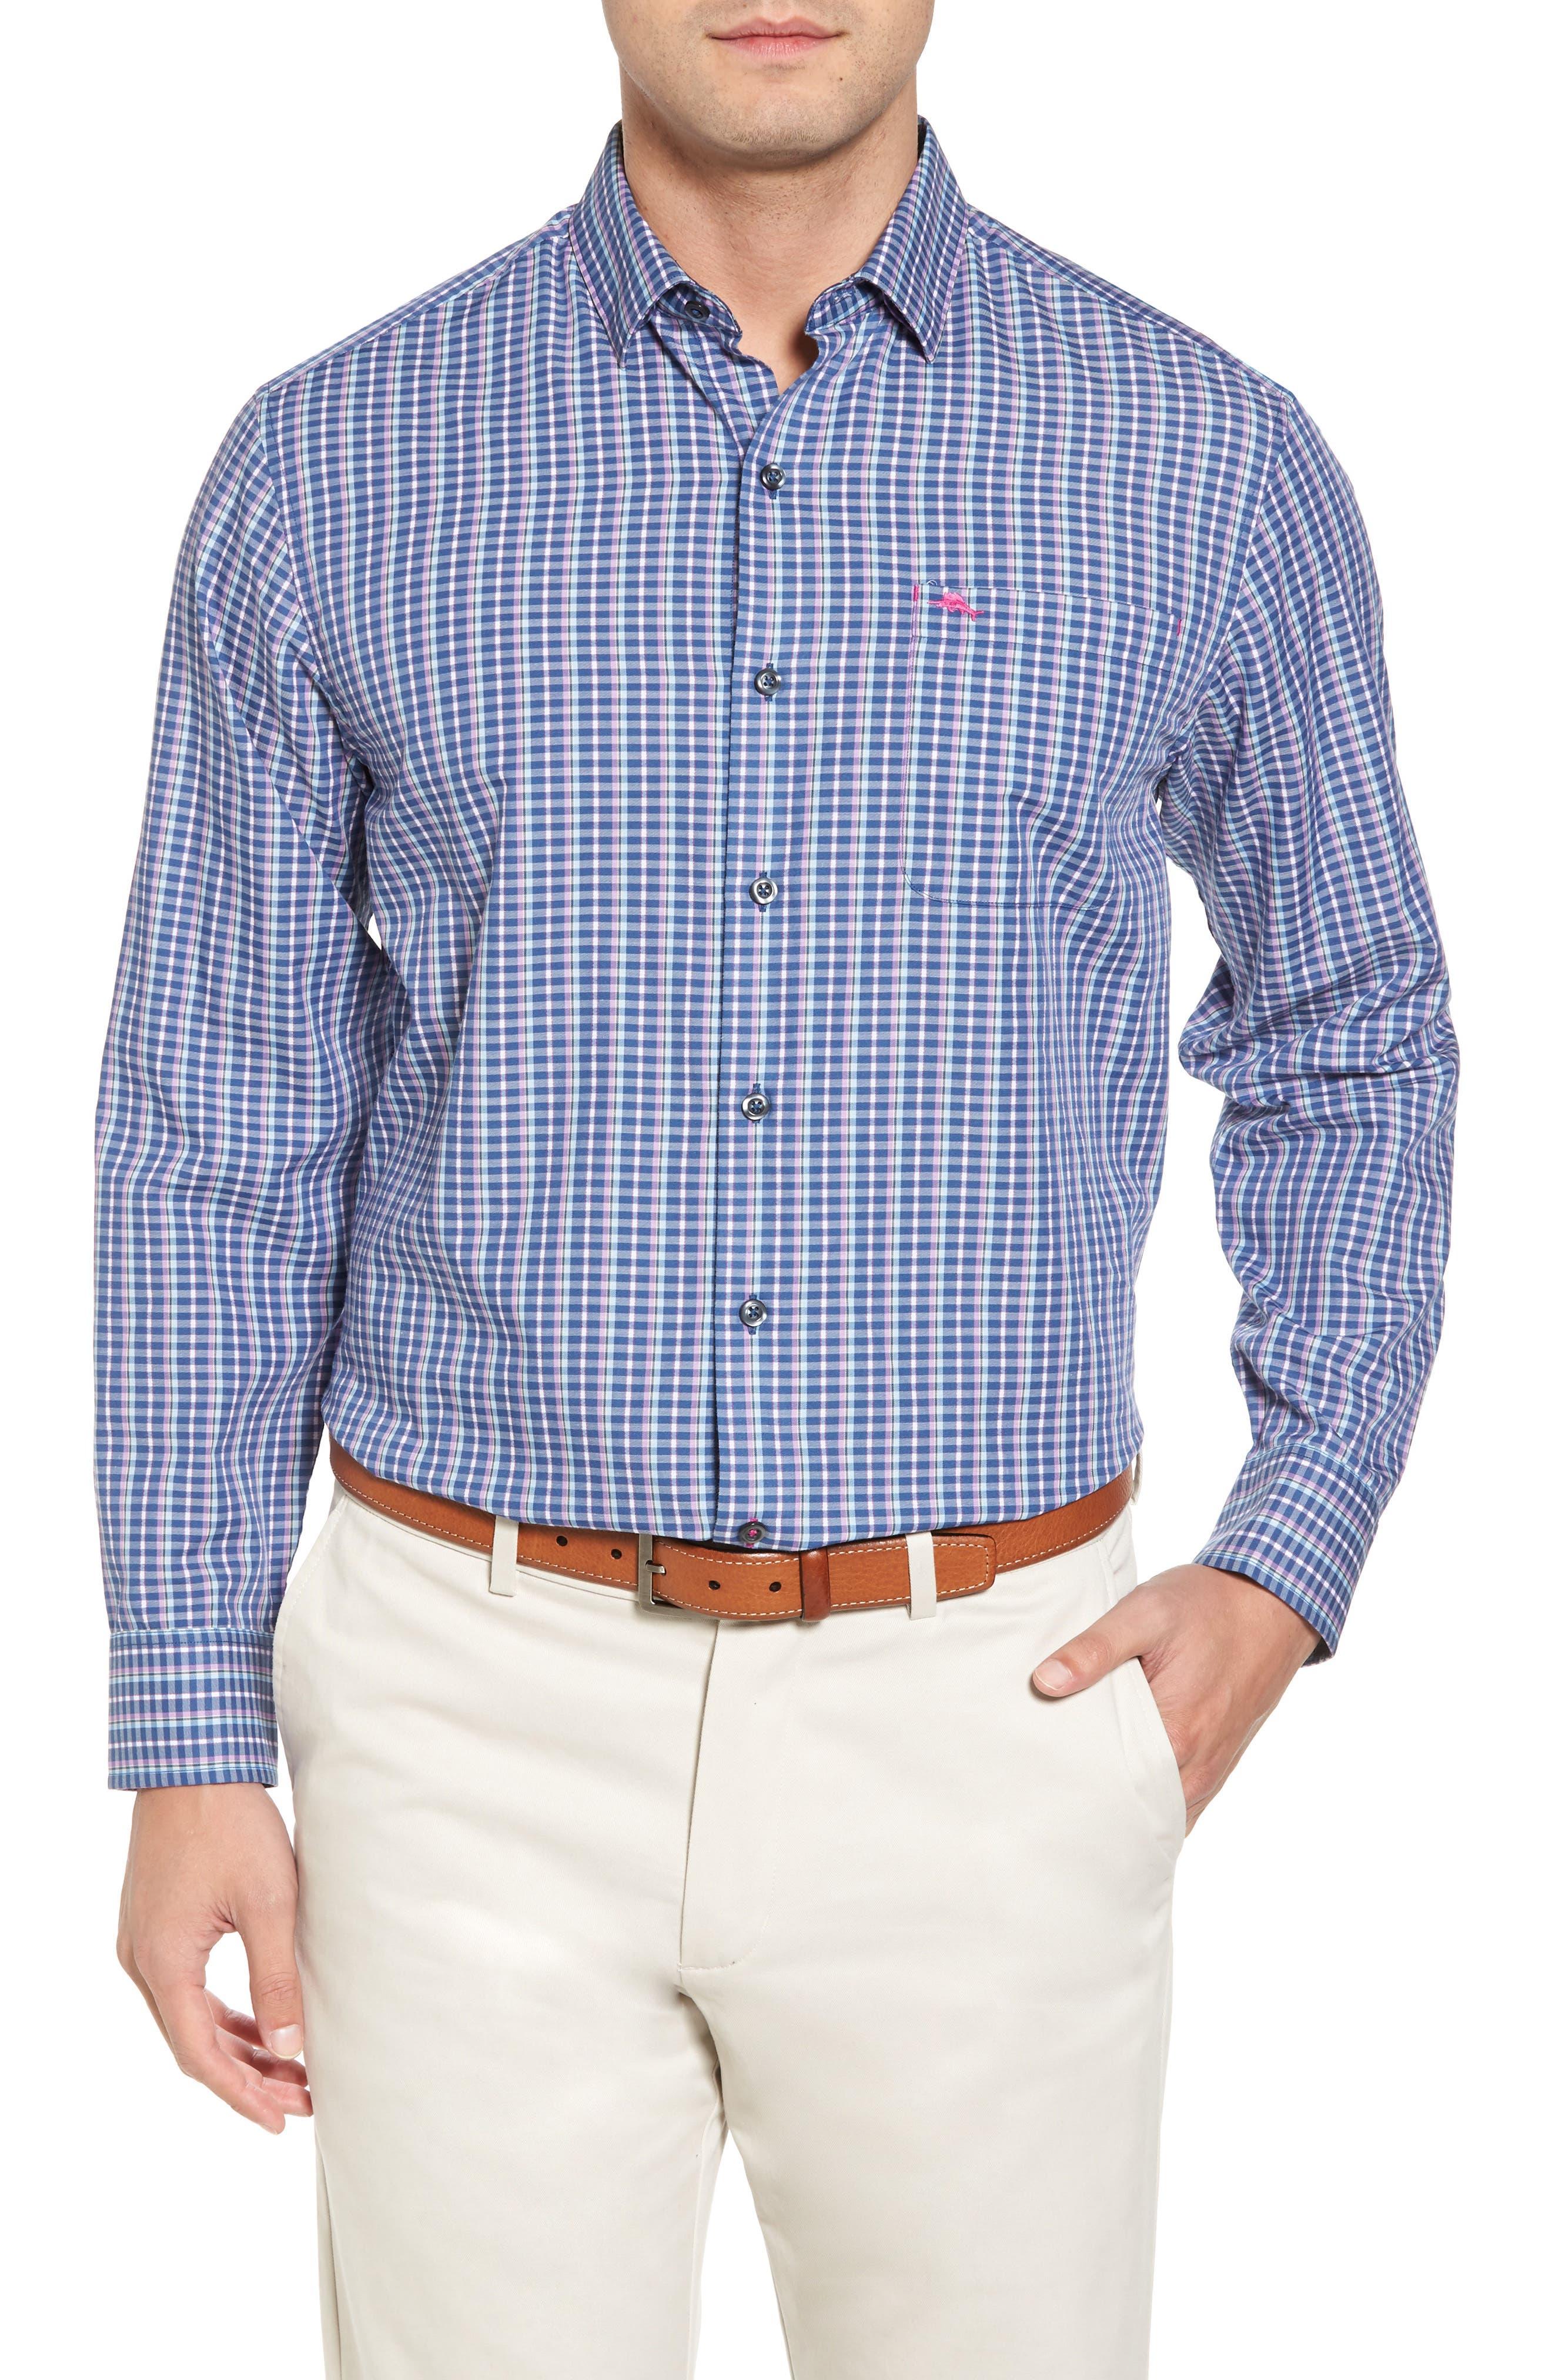 Cypress Cove Classic Fit Plaid Sport Shirt,                         Main,                         color, Kingdom Blue